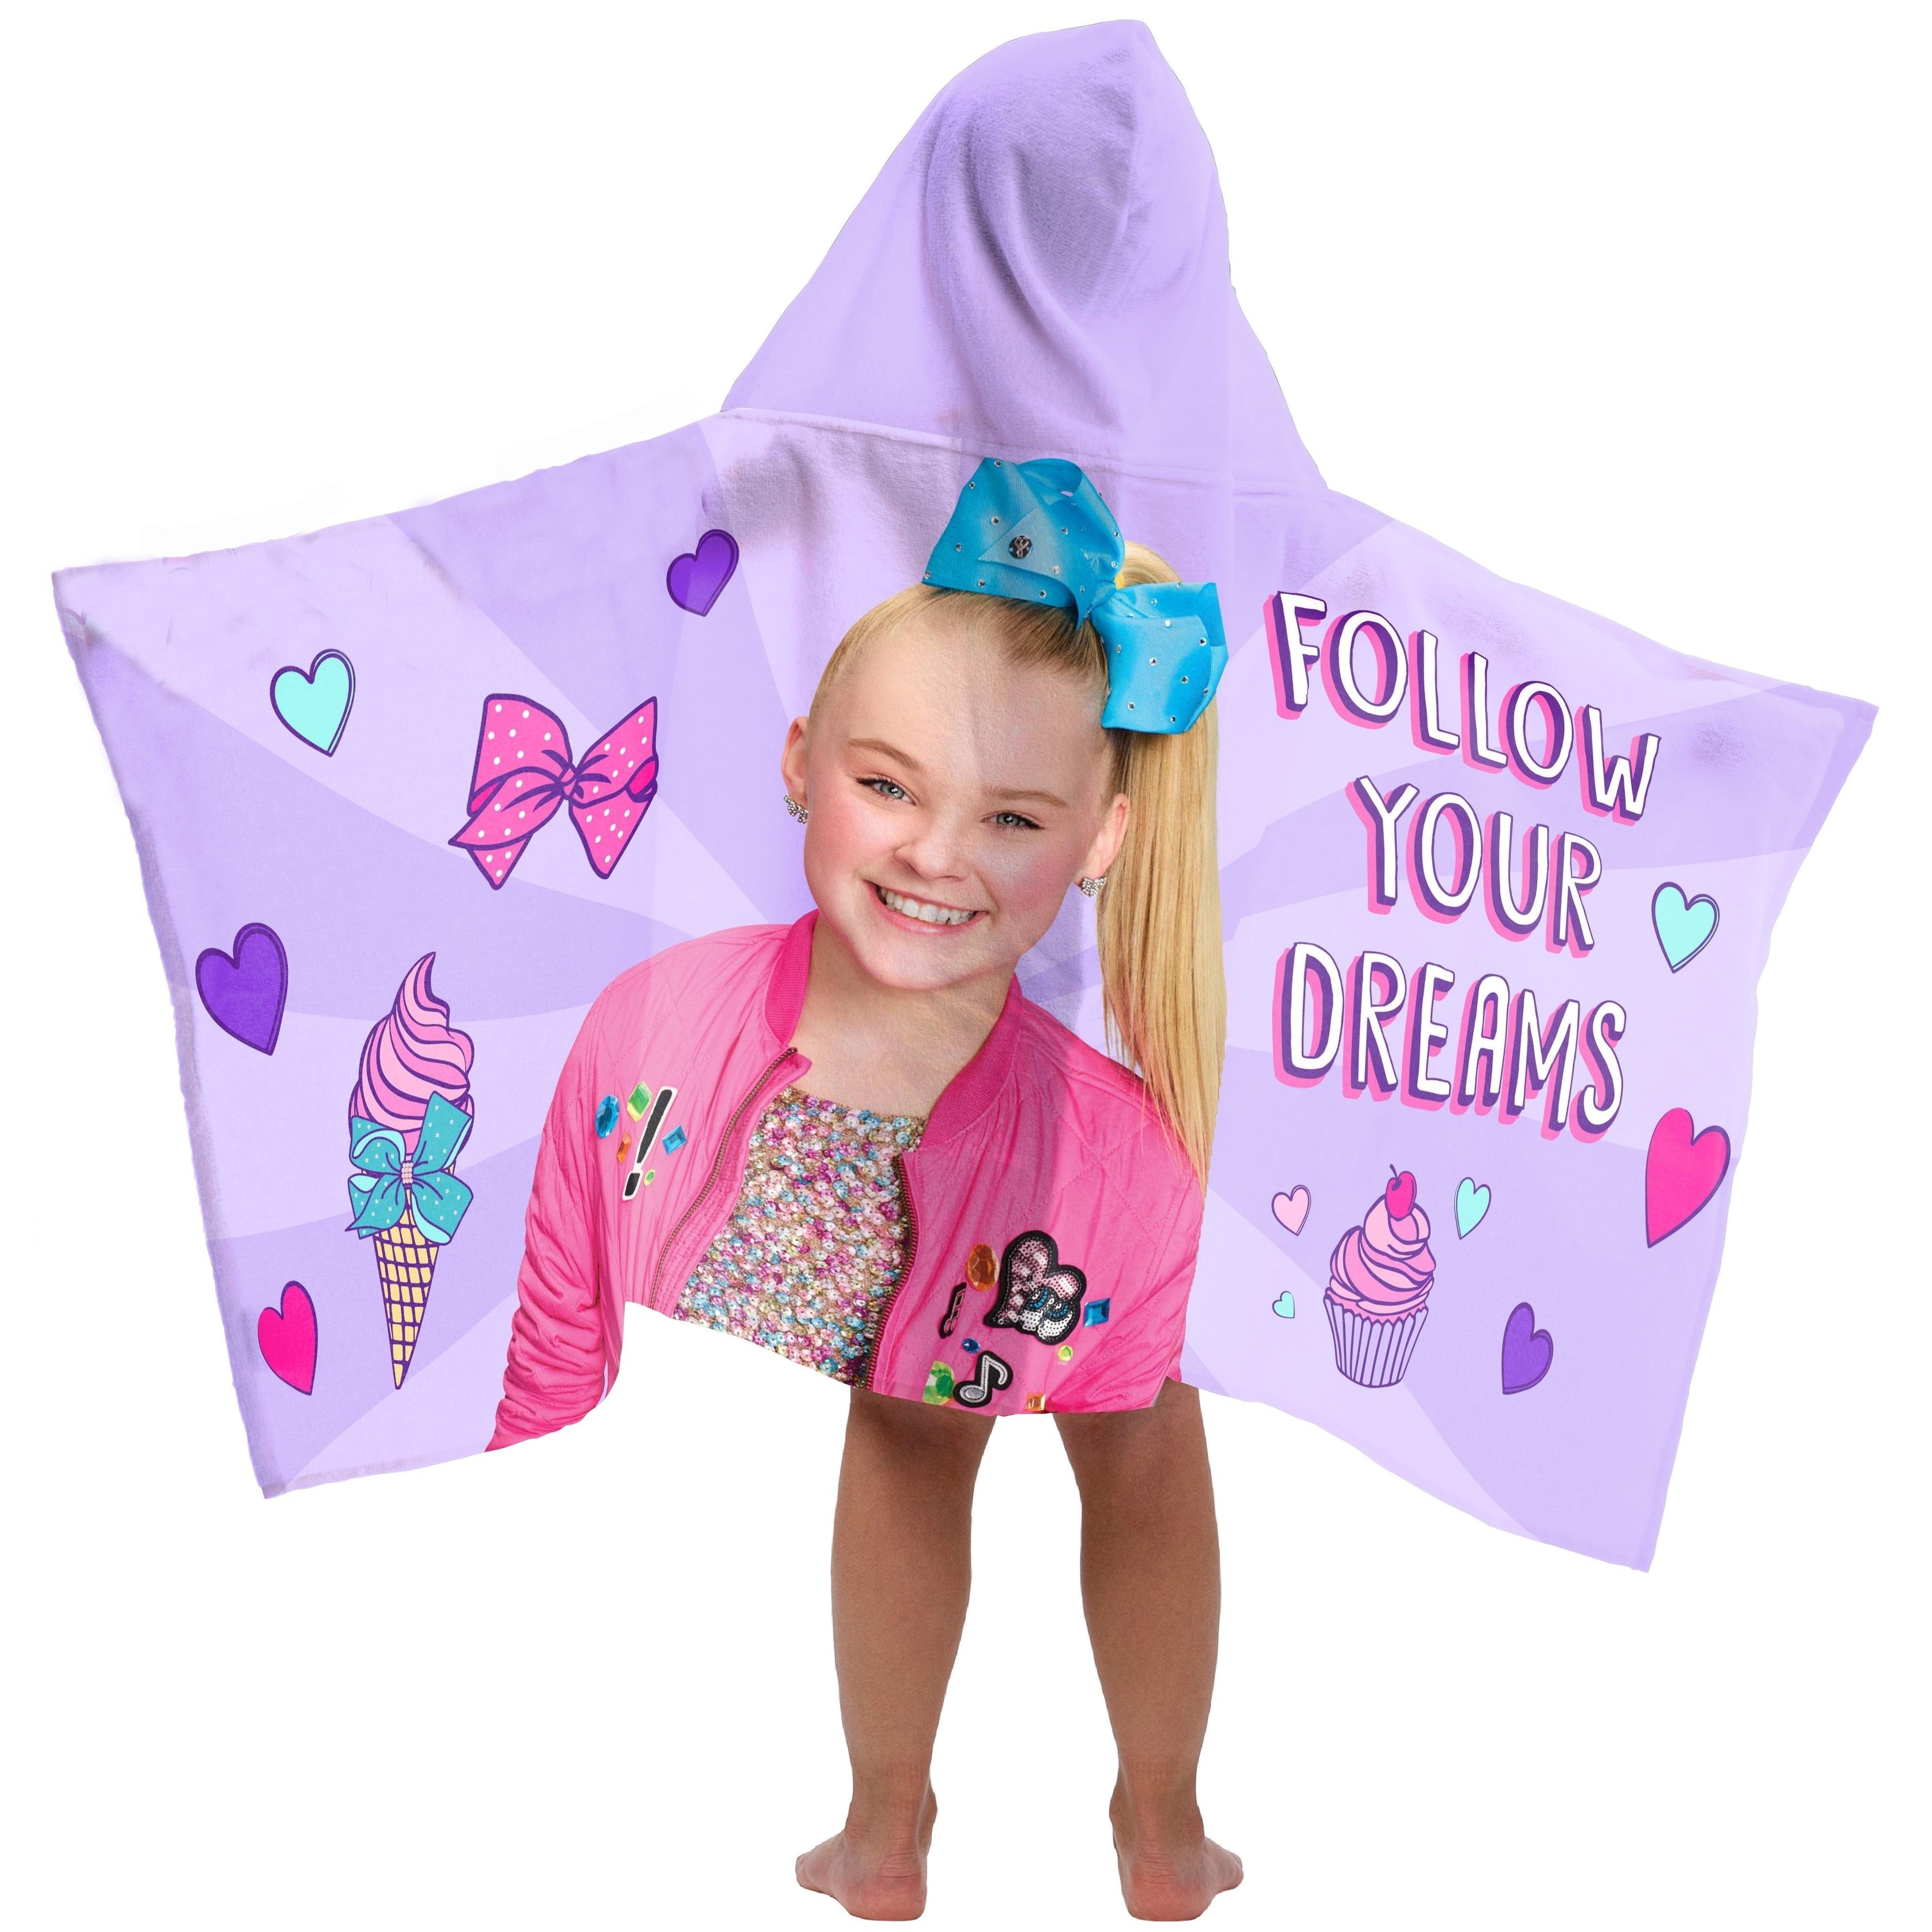 JoJo Siwa Dreams Bows Printed Beach Towel